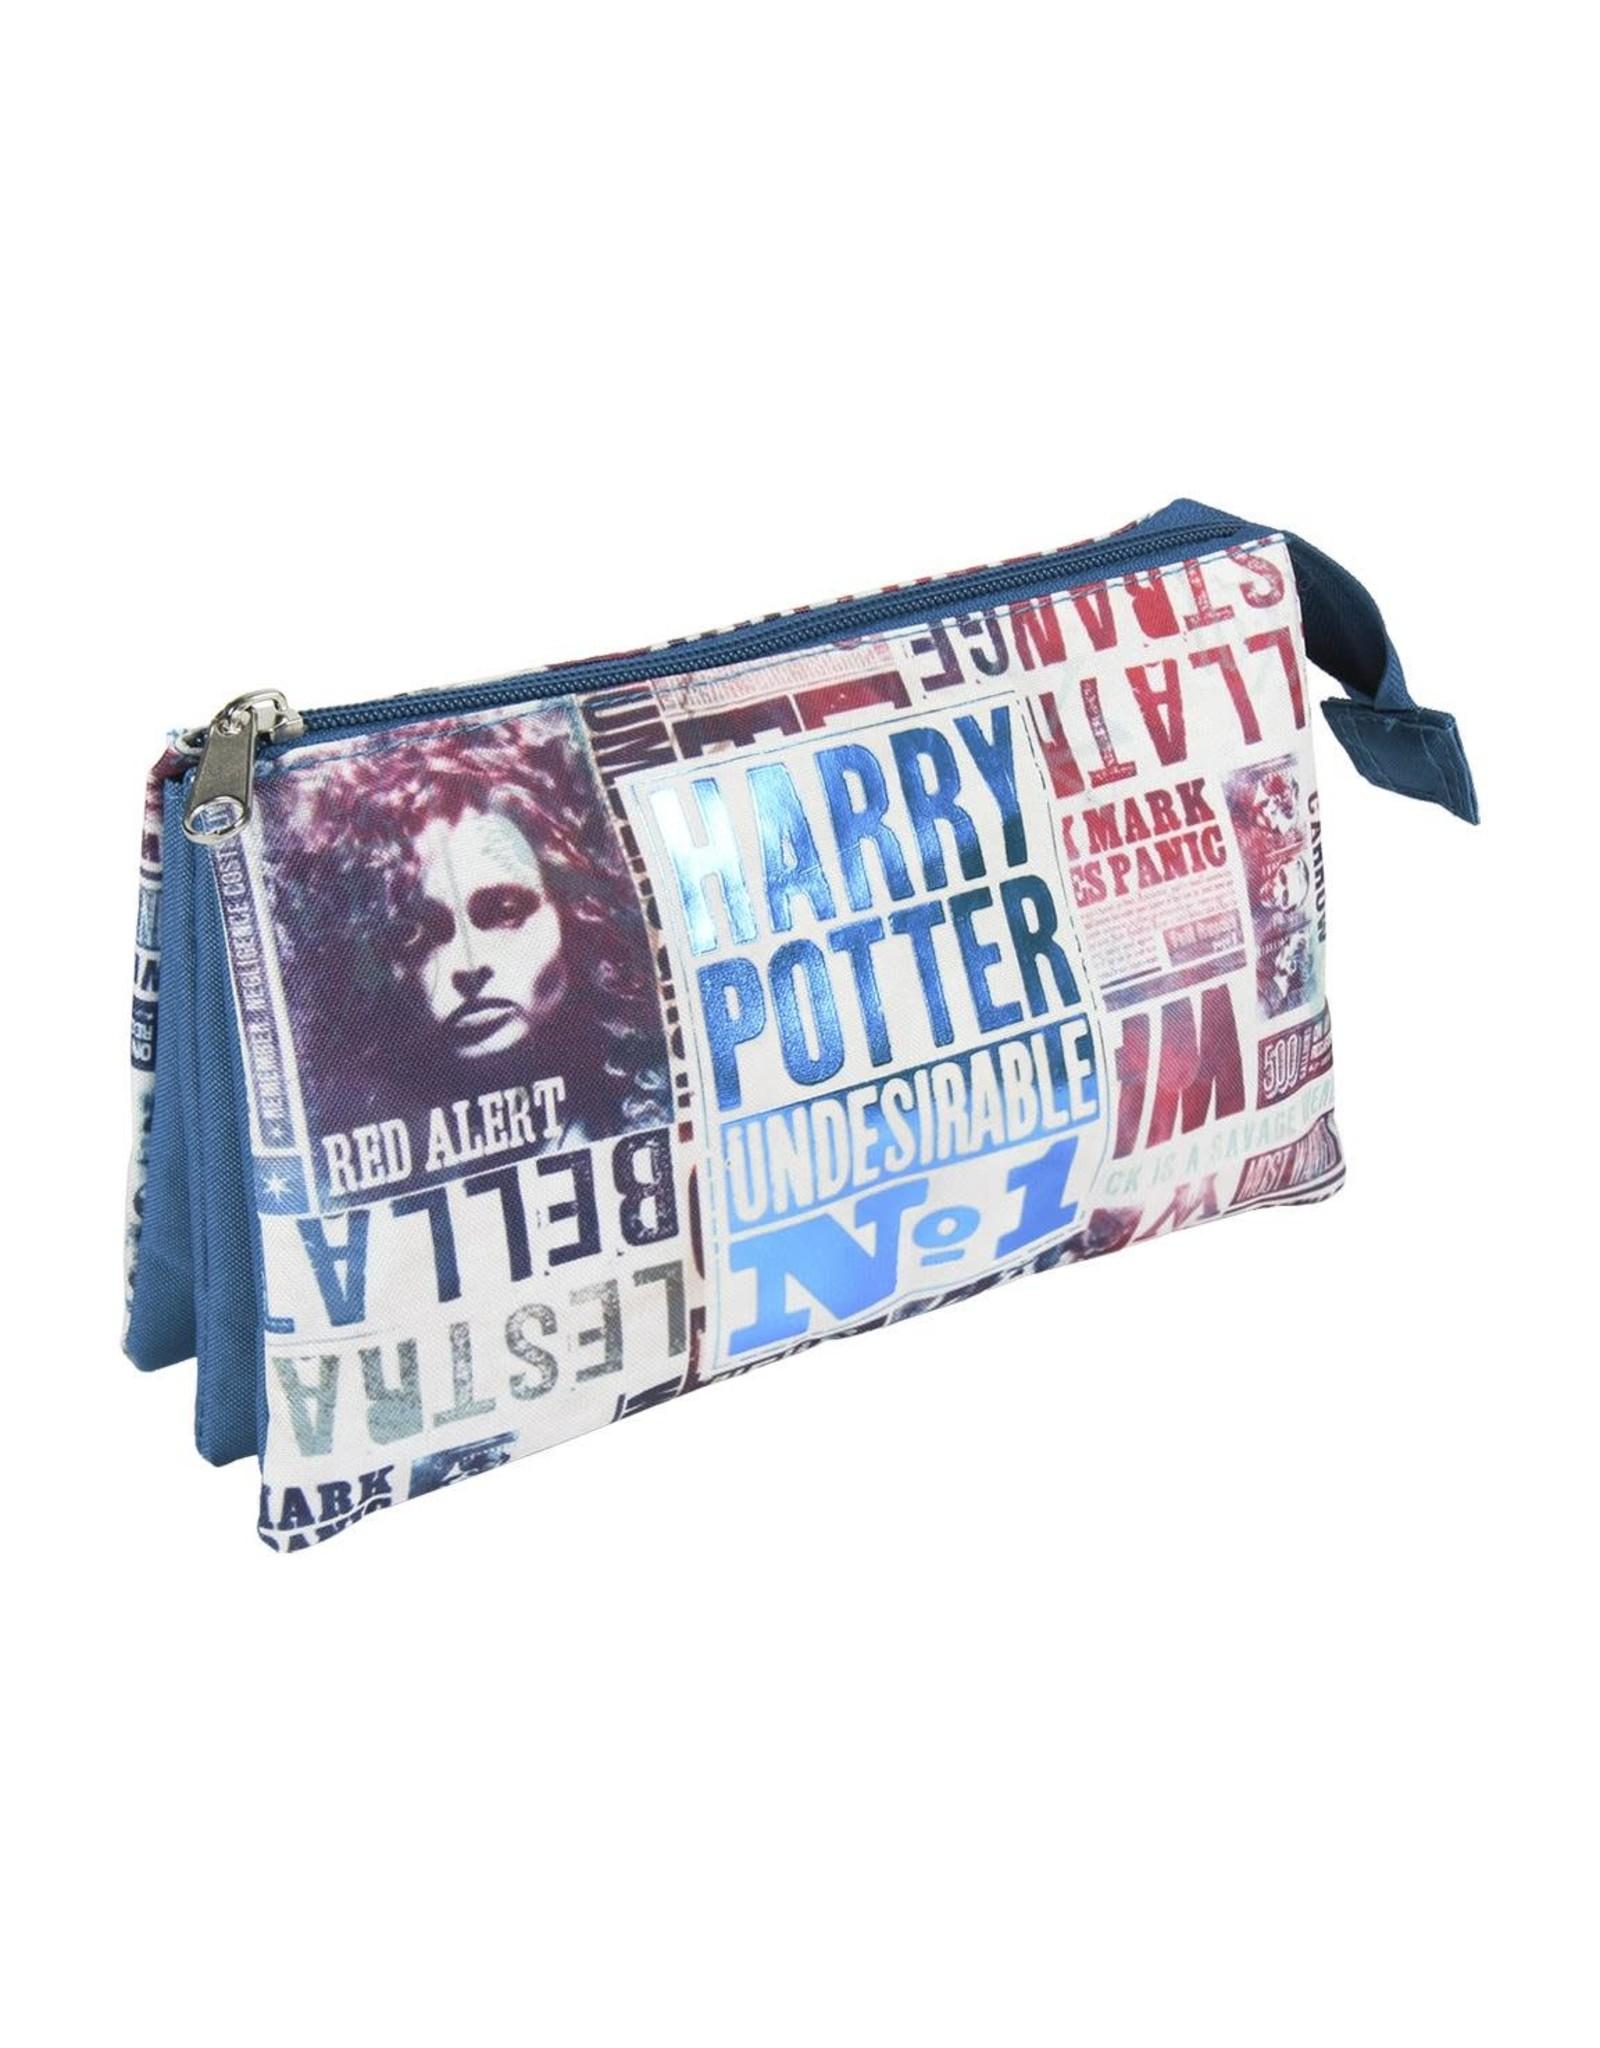 HARRY POTTER - 3 Compartments Pencil Case